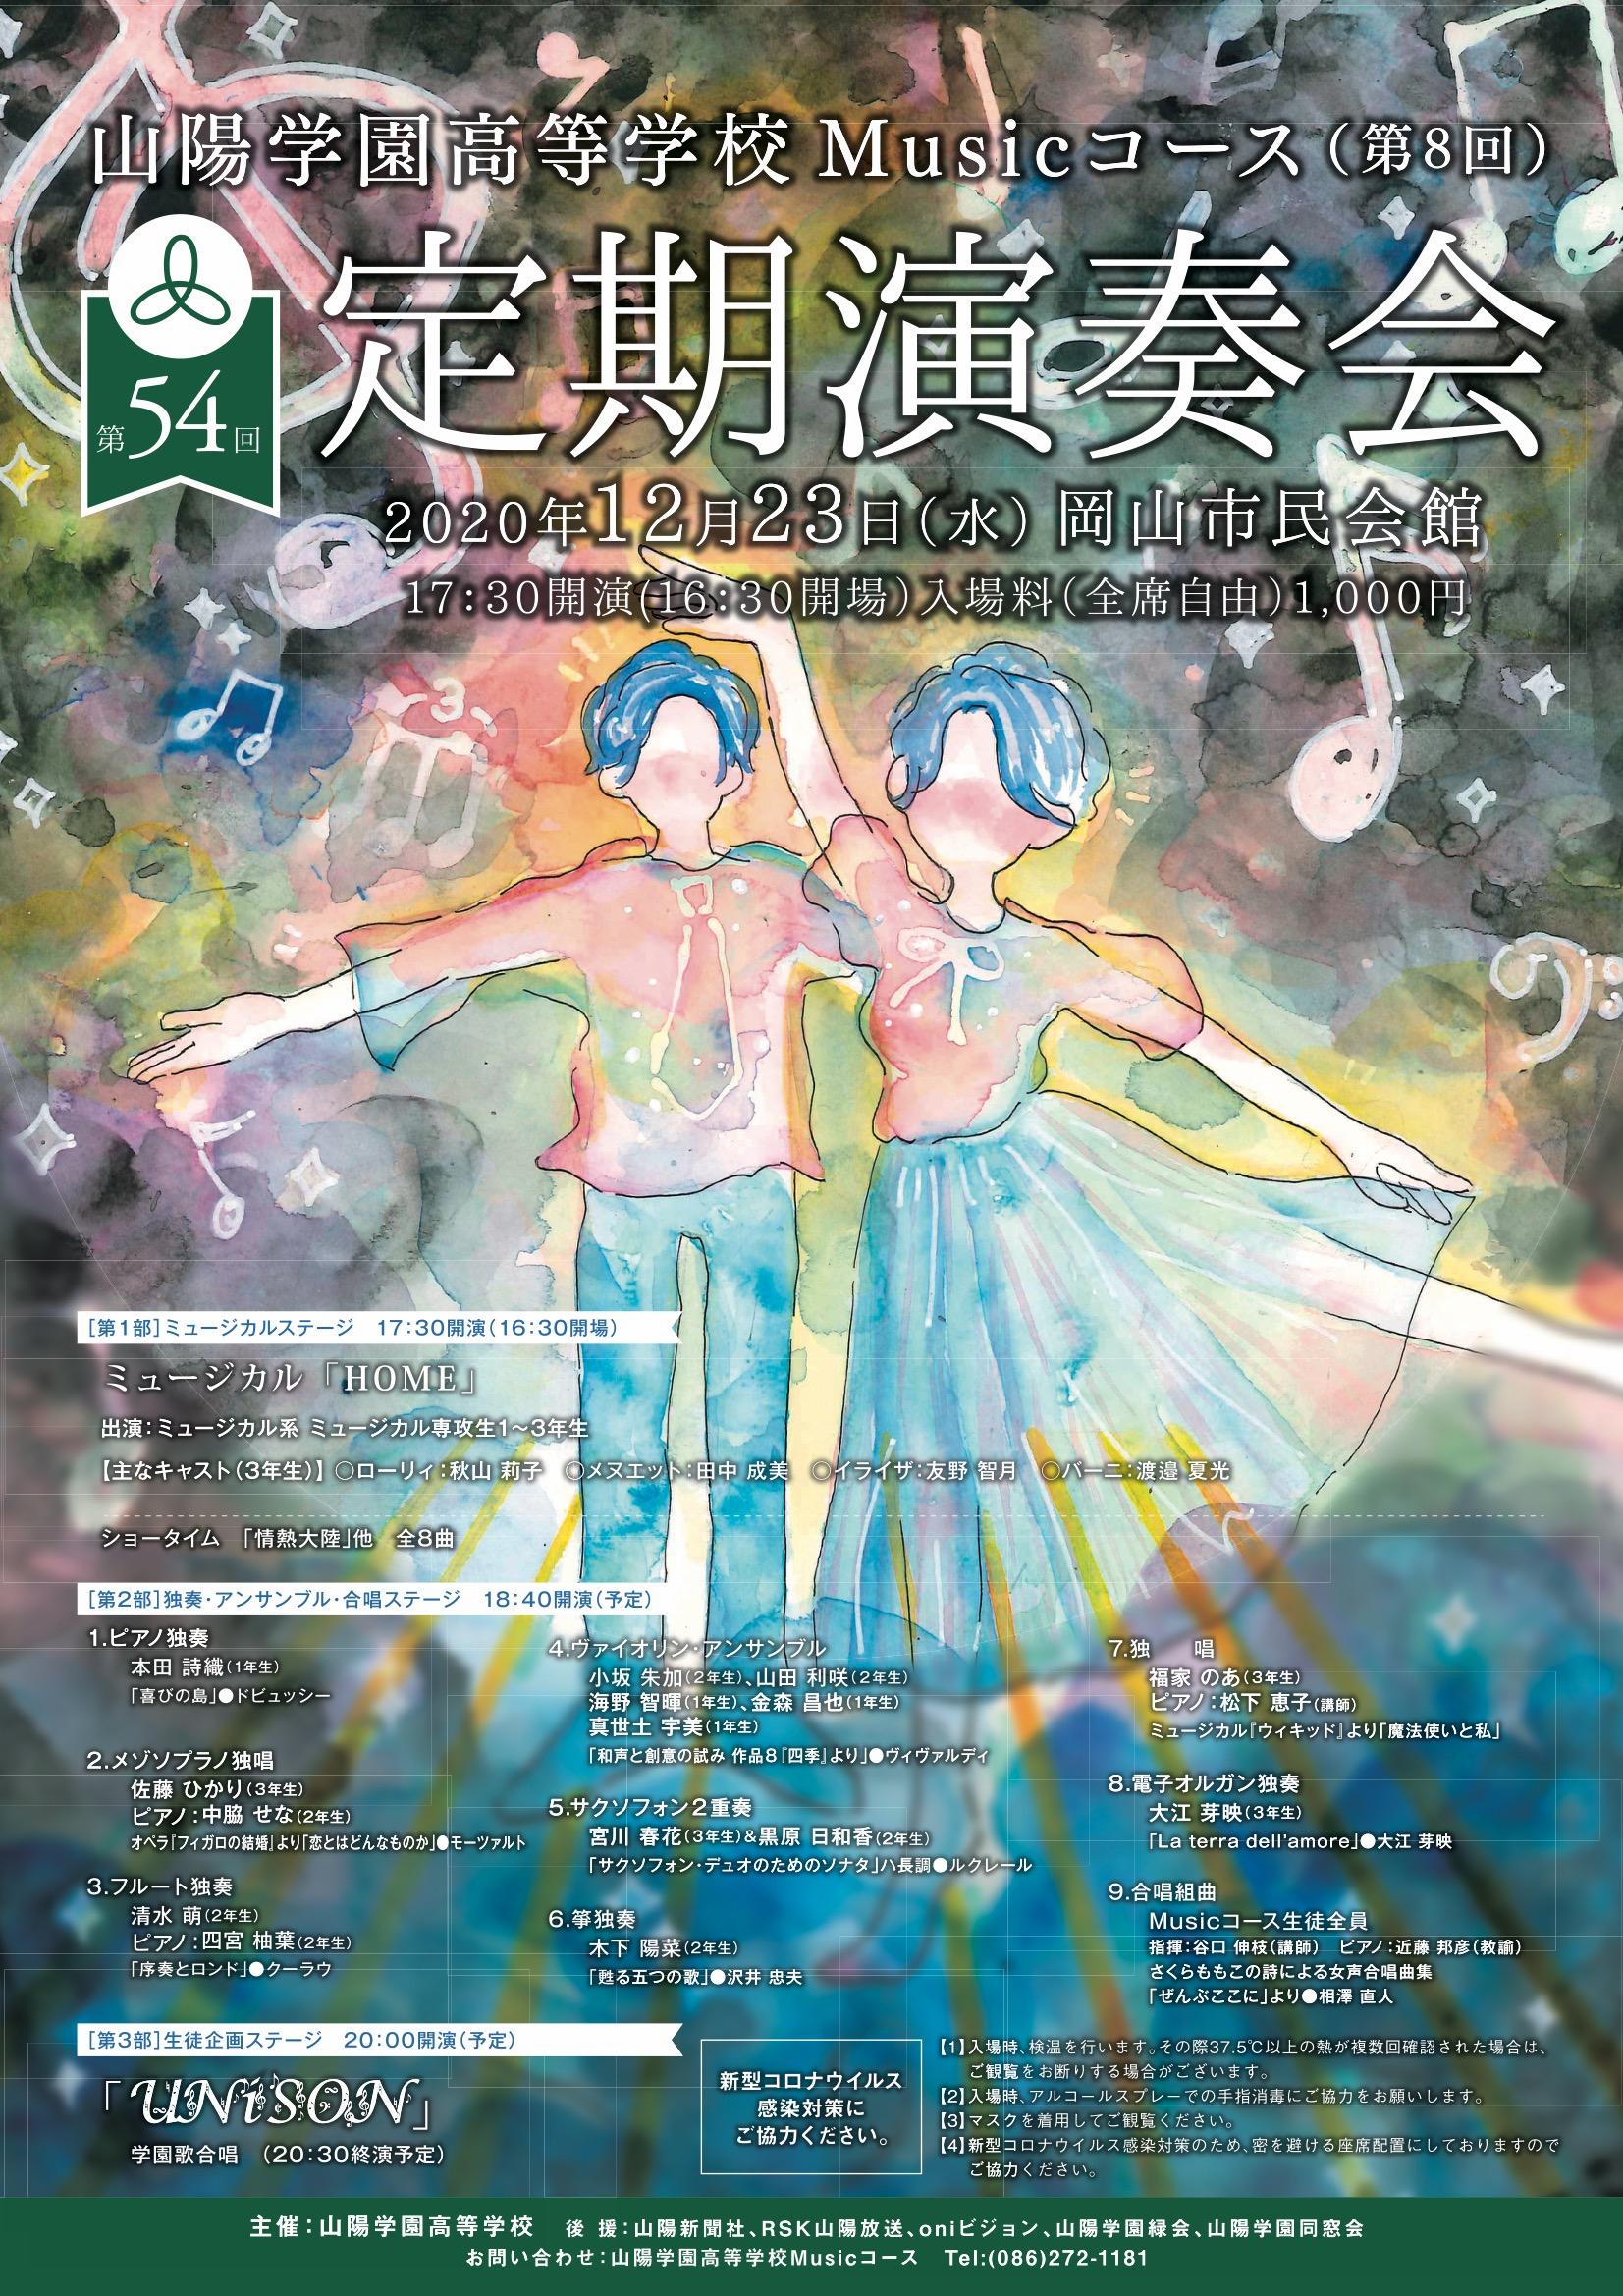 Music第54回定演チラシ